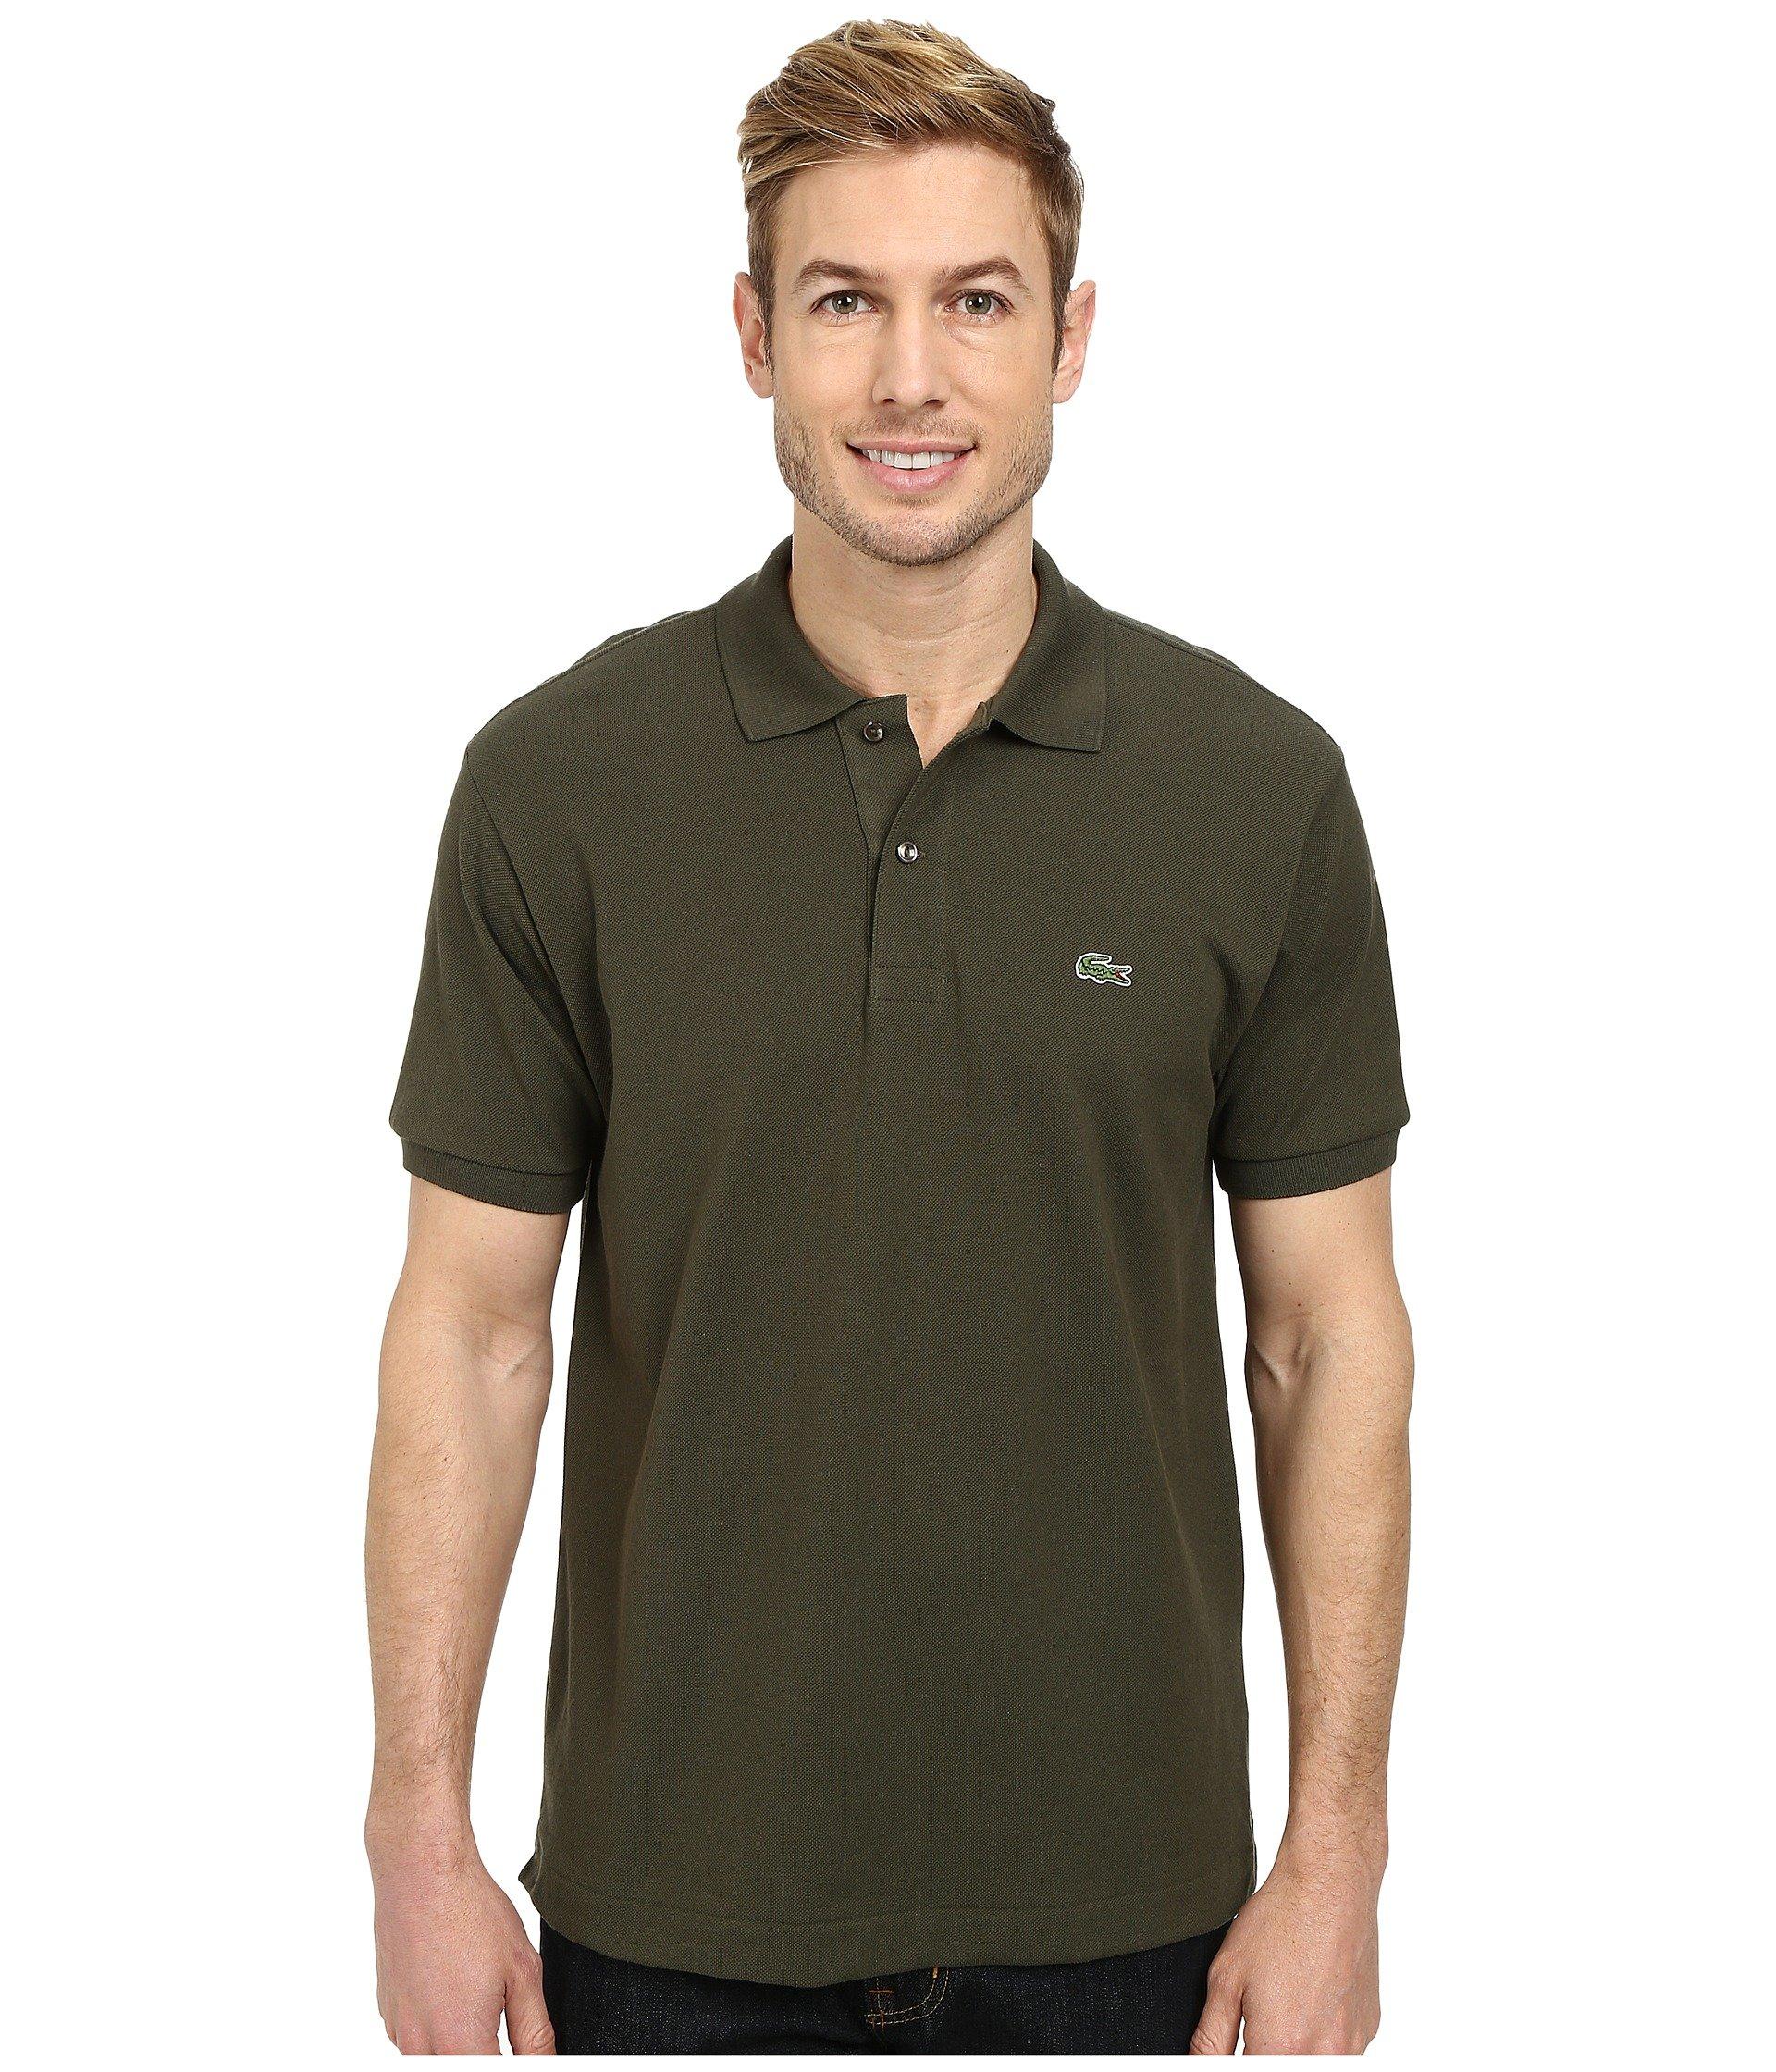 LACOSTE L1212 Classic Pique Polo Shirt, Baobab Green